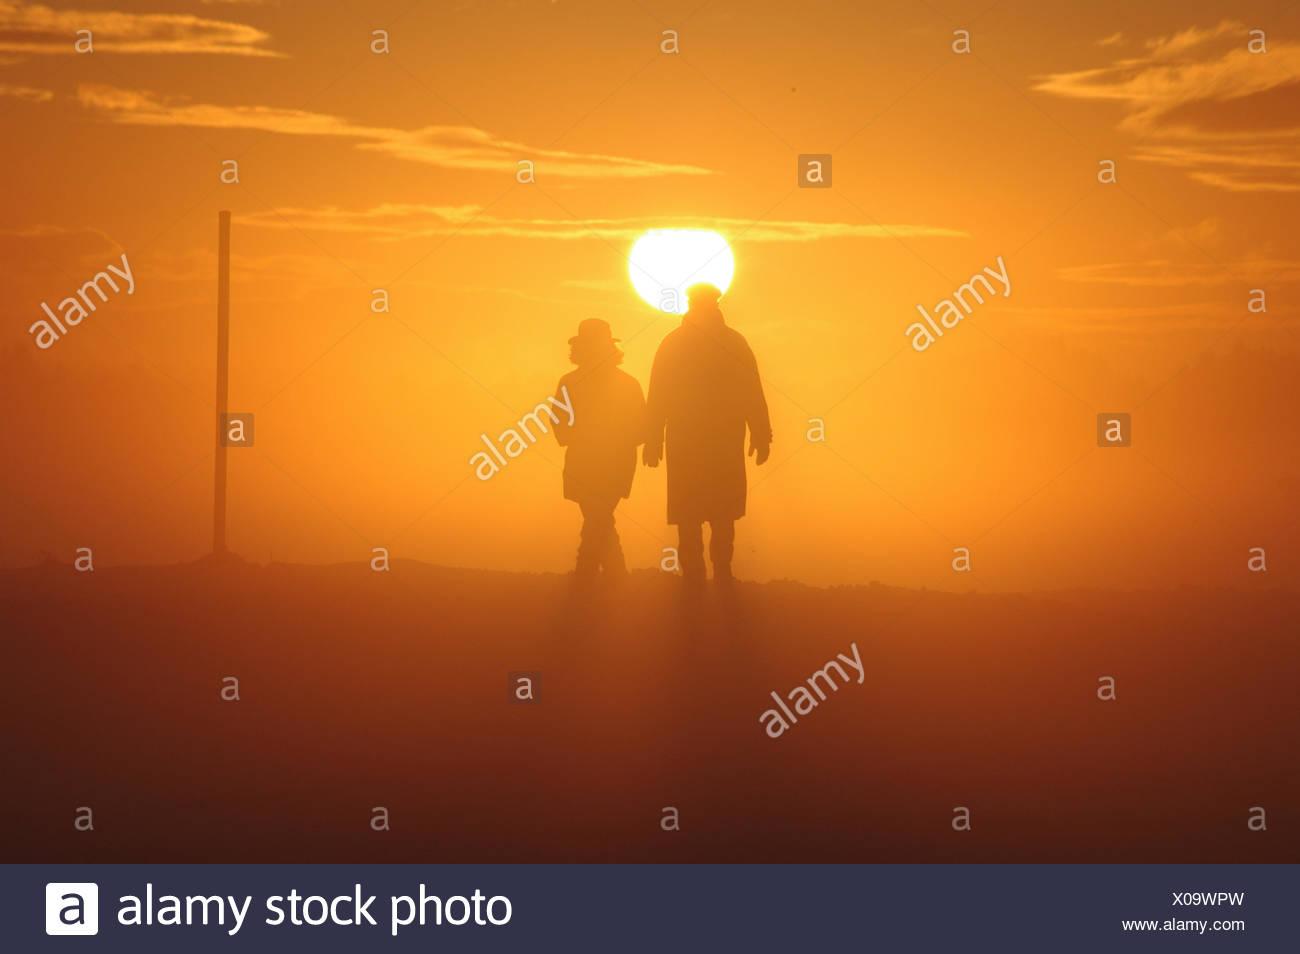 sunset,fog,silhouette - Stock Image